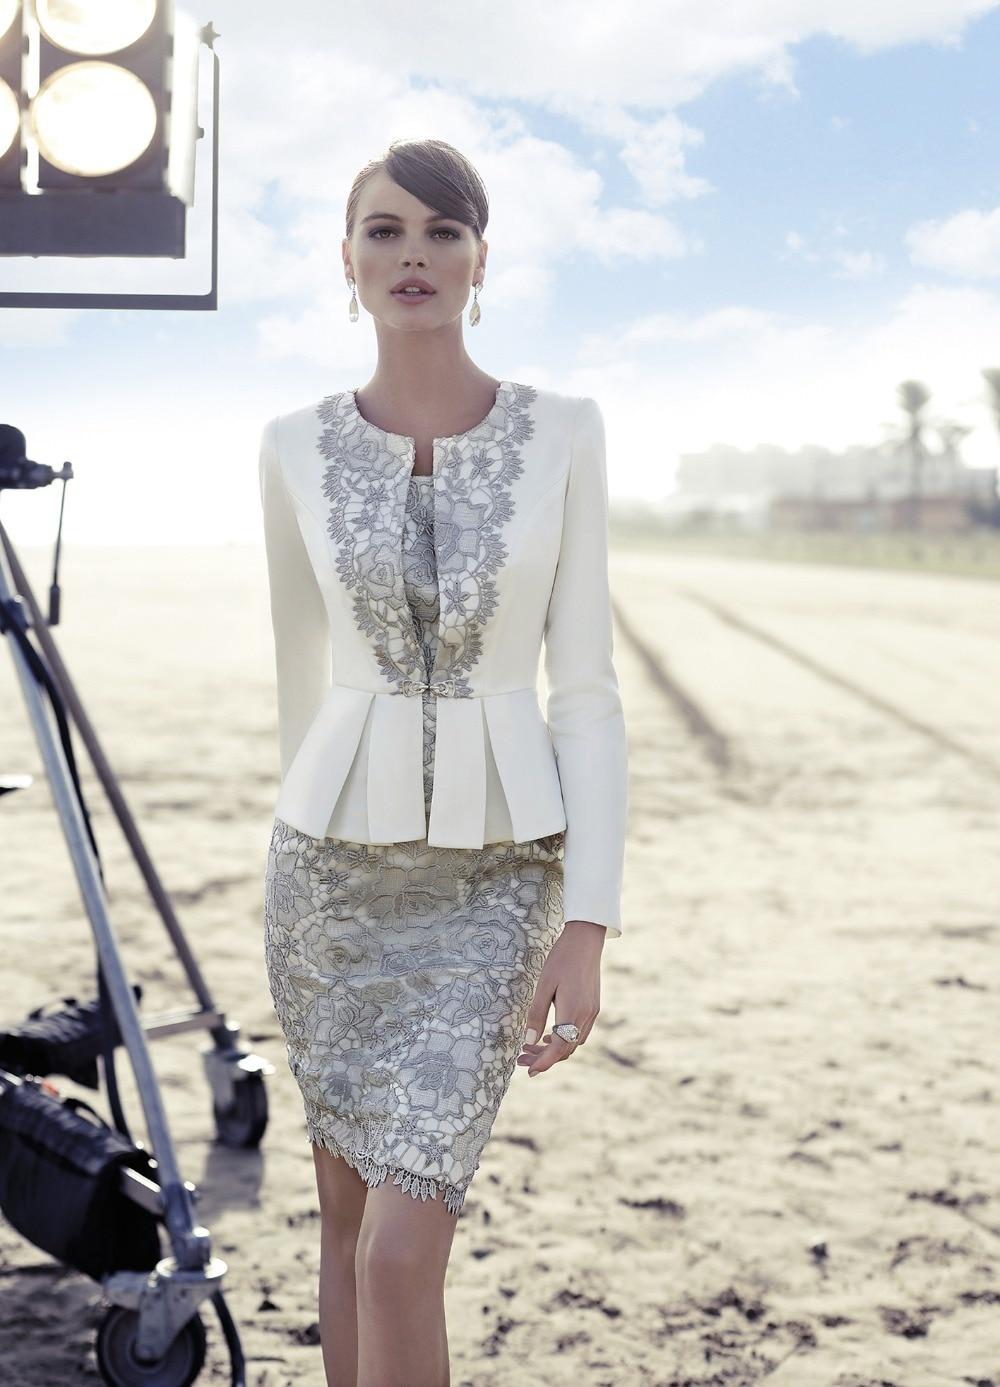 Elegant Lvory Short Lace Mother Of Bride Dress With Jacket Knee-Length Vestidos Madrinha Vestido Mae Da Noiva Curto MBD65